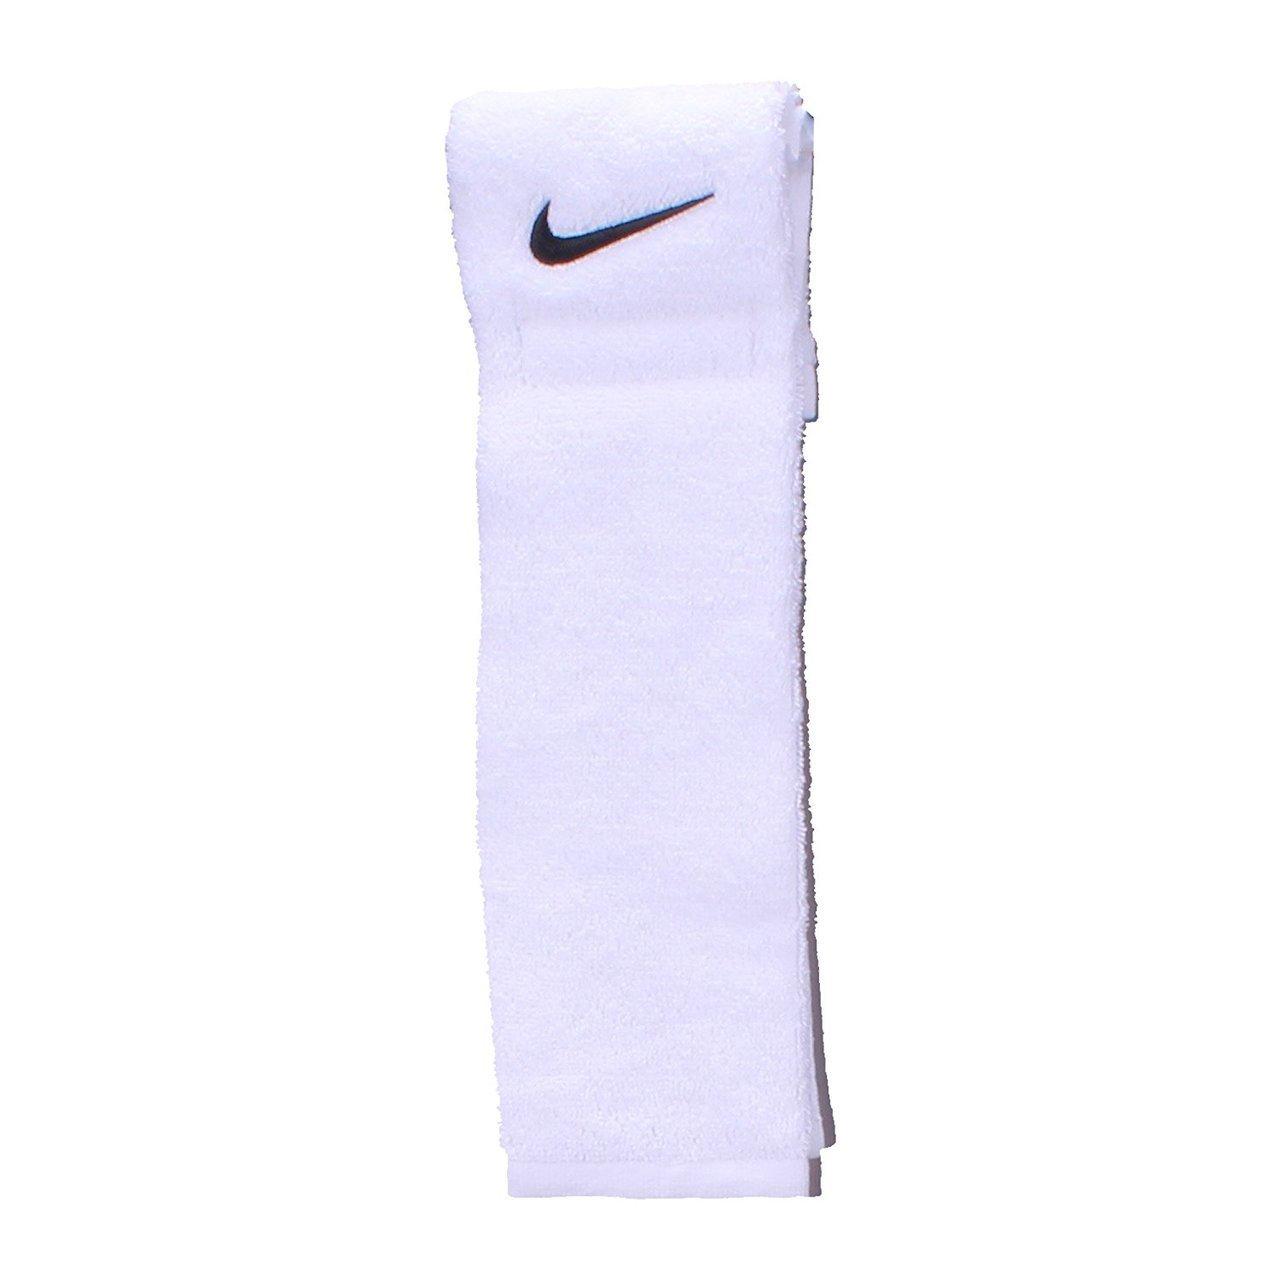 nike towel for football